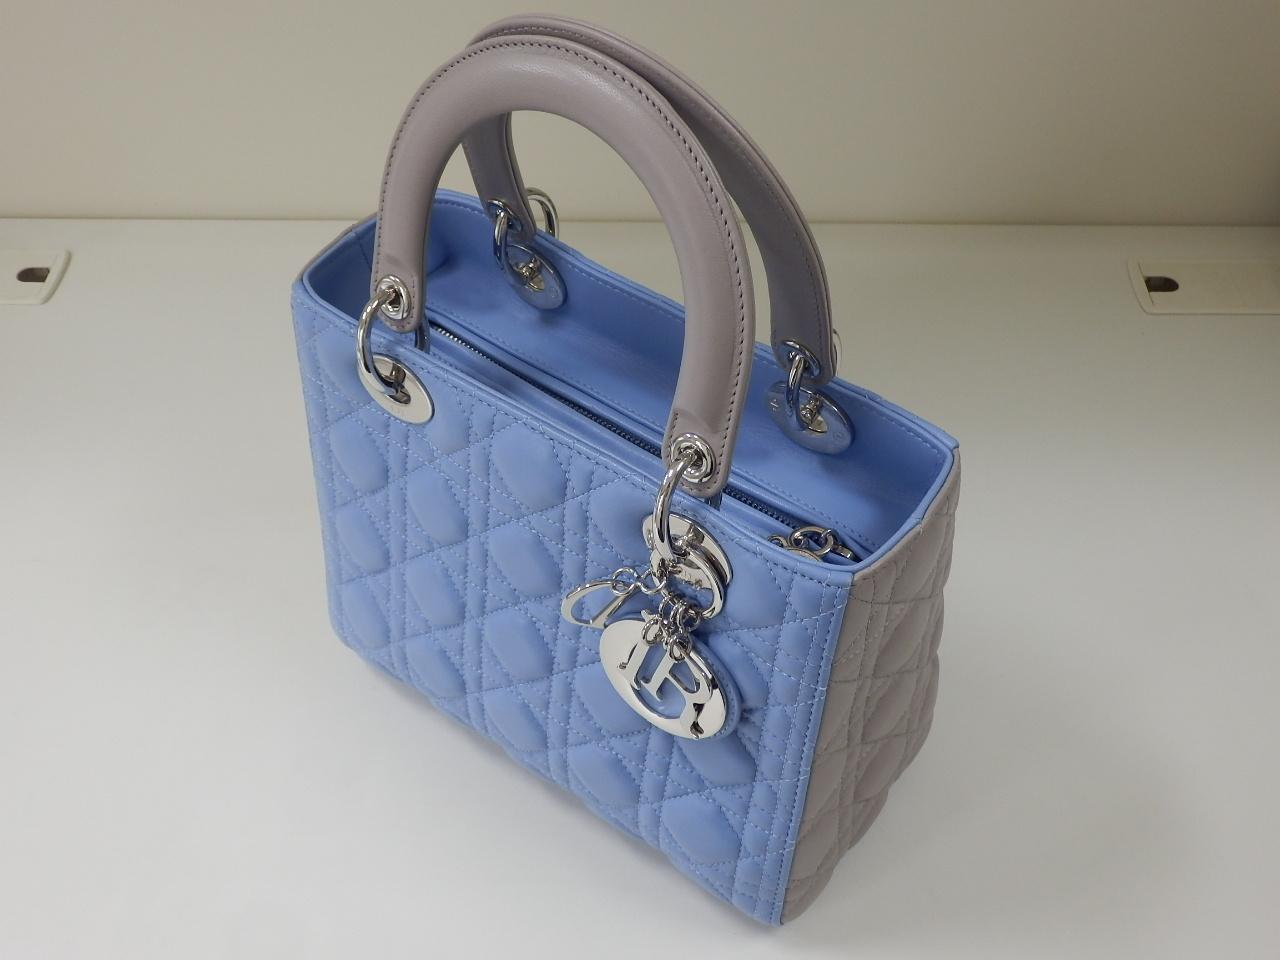 Dior(ディオール) レディディオール バイカラー2wayバッグ